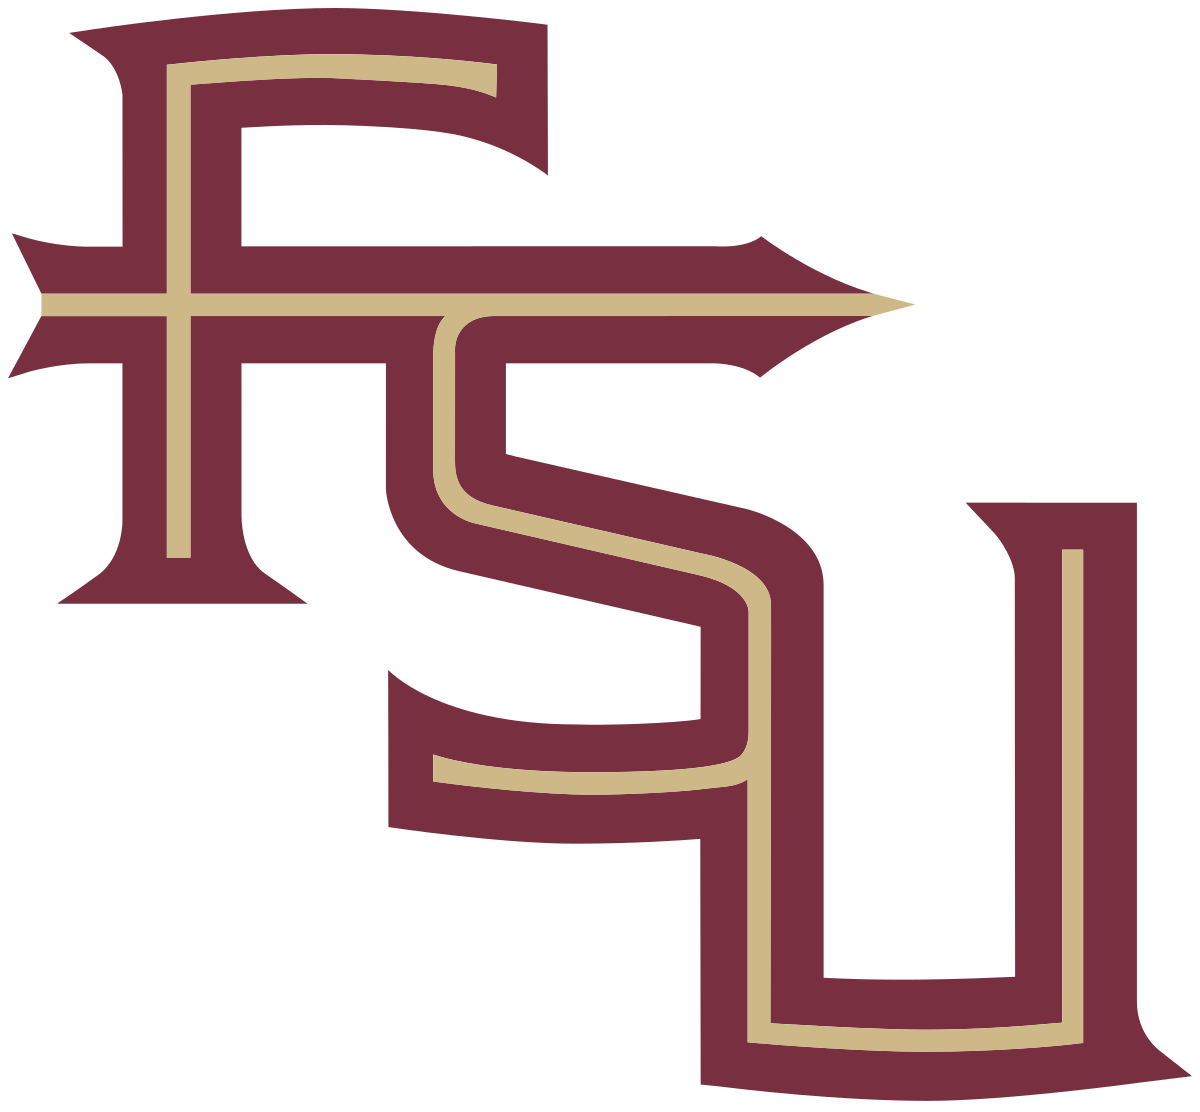 1200x1112 Florida State University Mascot Clipart Amp Florida State University